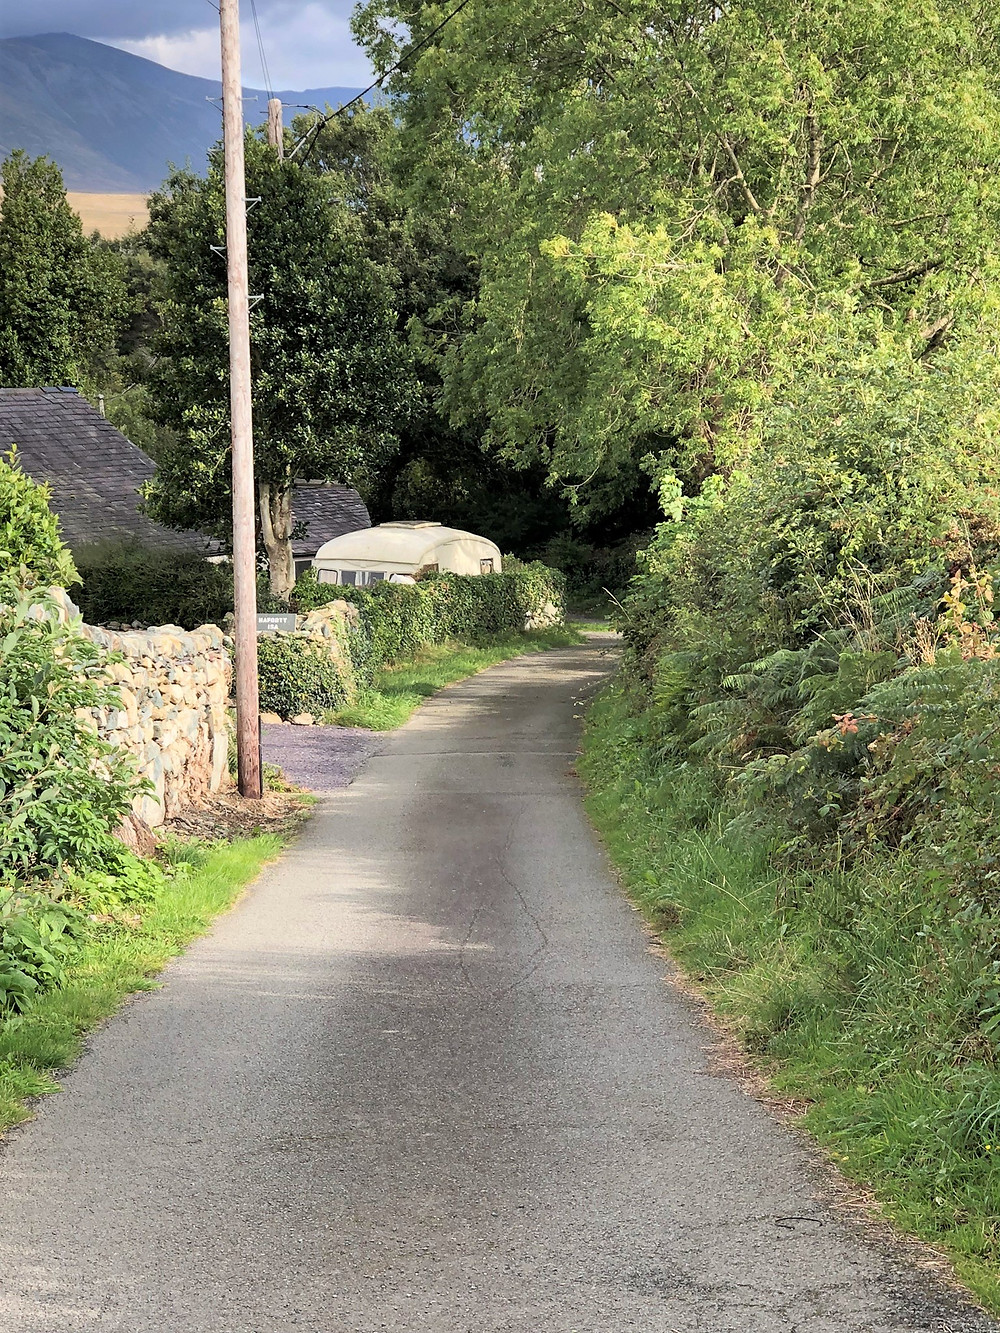 Narrow single lane road in Tregarth Wales.  Lon Hafoty